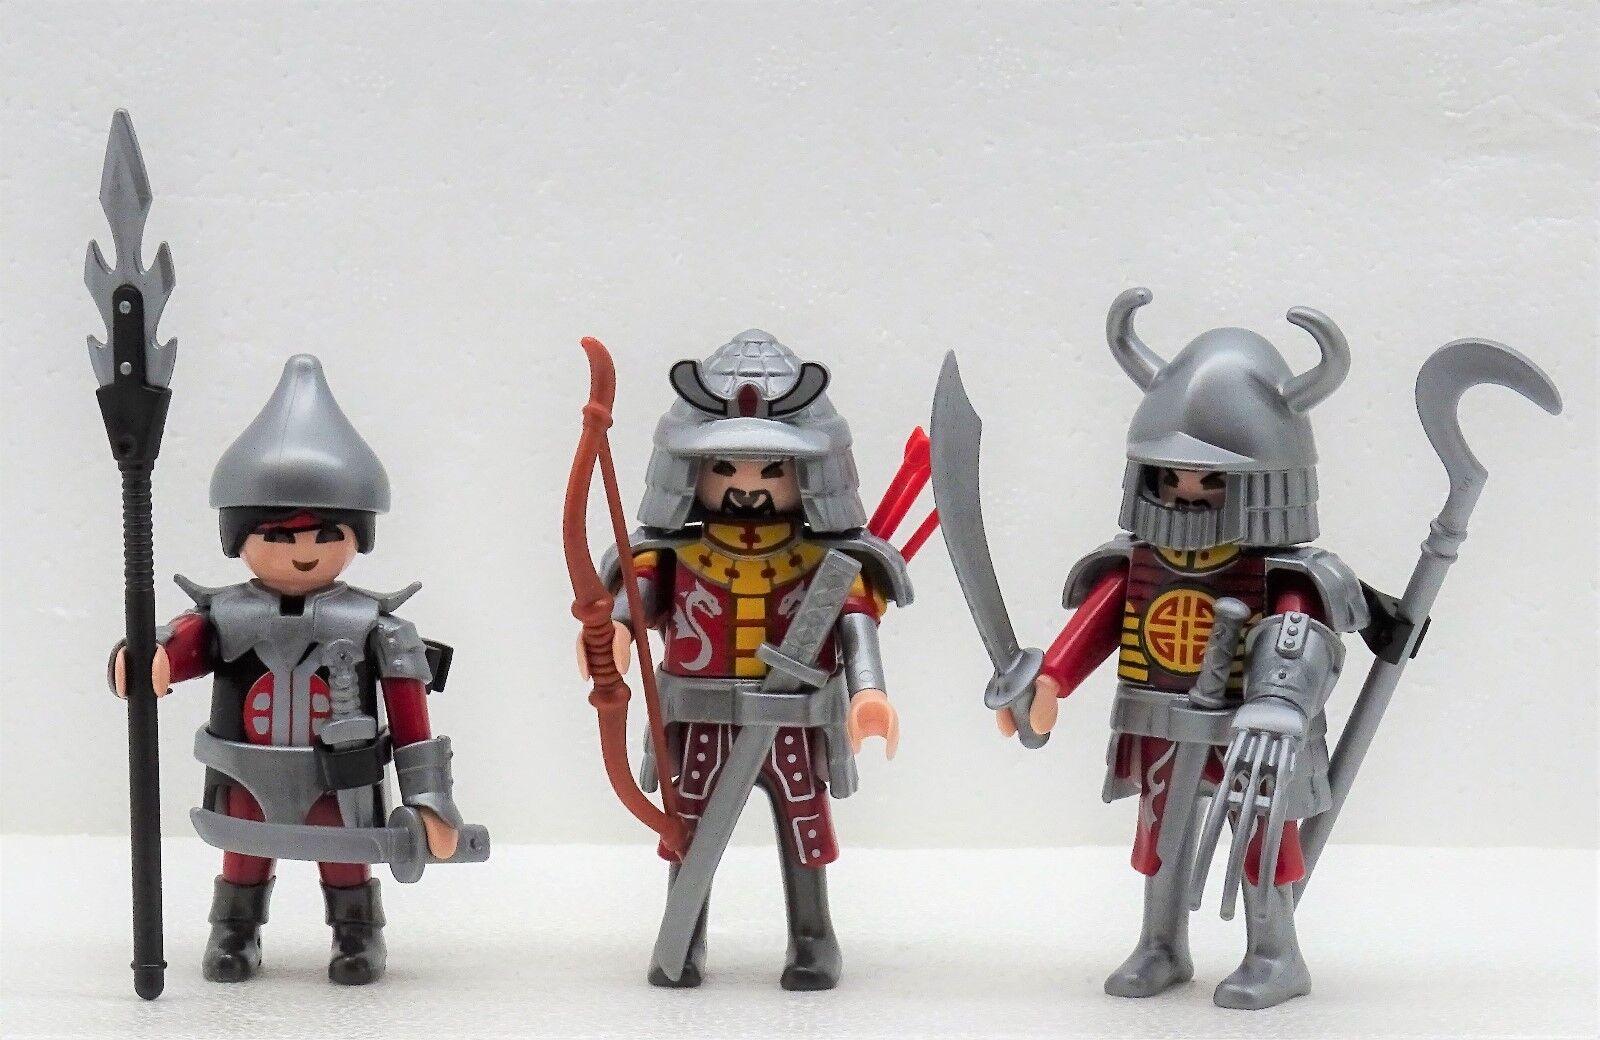 3 Pesado Bewaffnete Asia Caballero Samurai Playmobil Dragons Dragons Dragons en Original Lámina  n ° 1 en línea